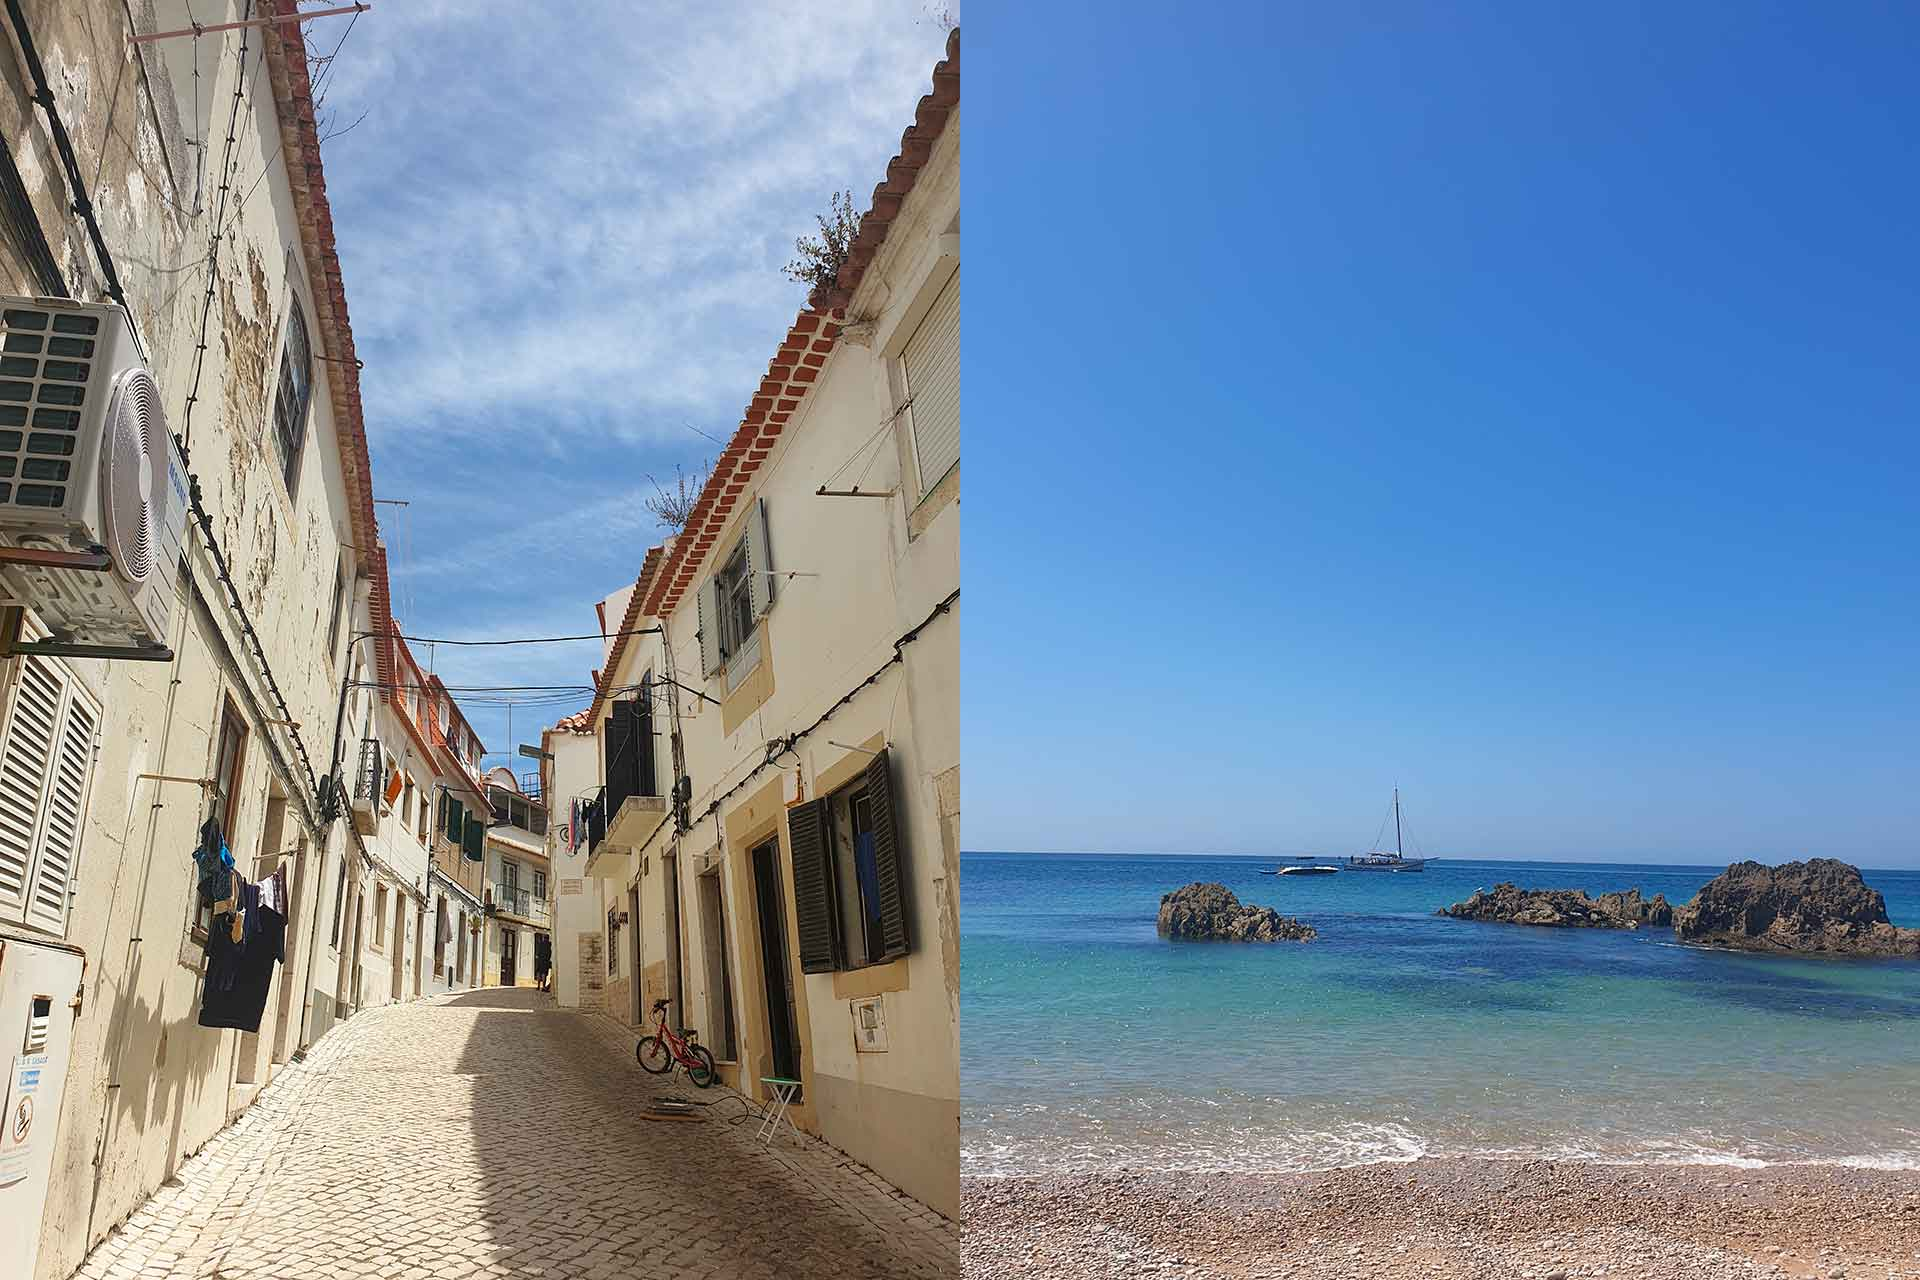 Lisbona E Dintorni: Cascais E Setubal, Perché Ne Vale La Pena